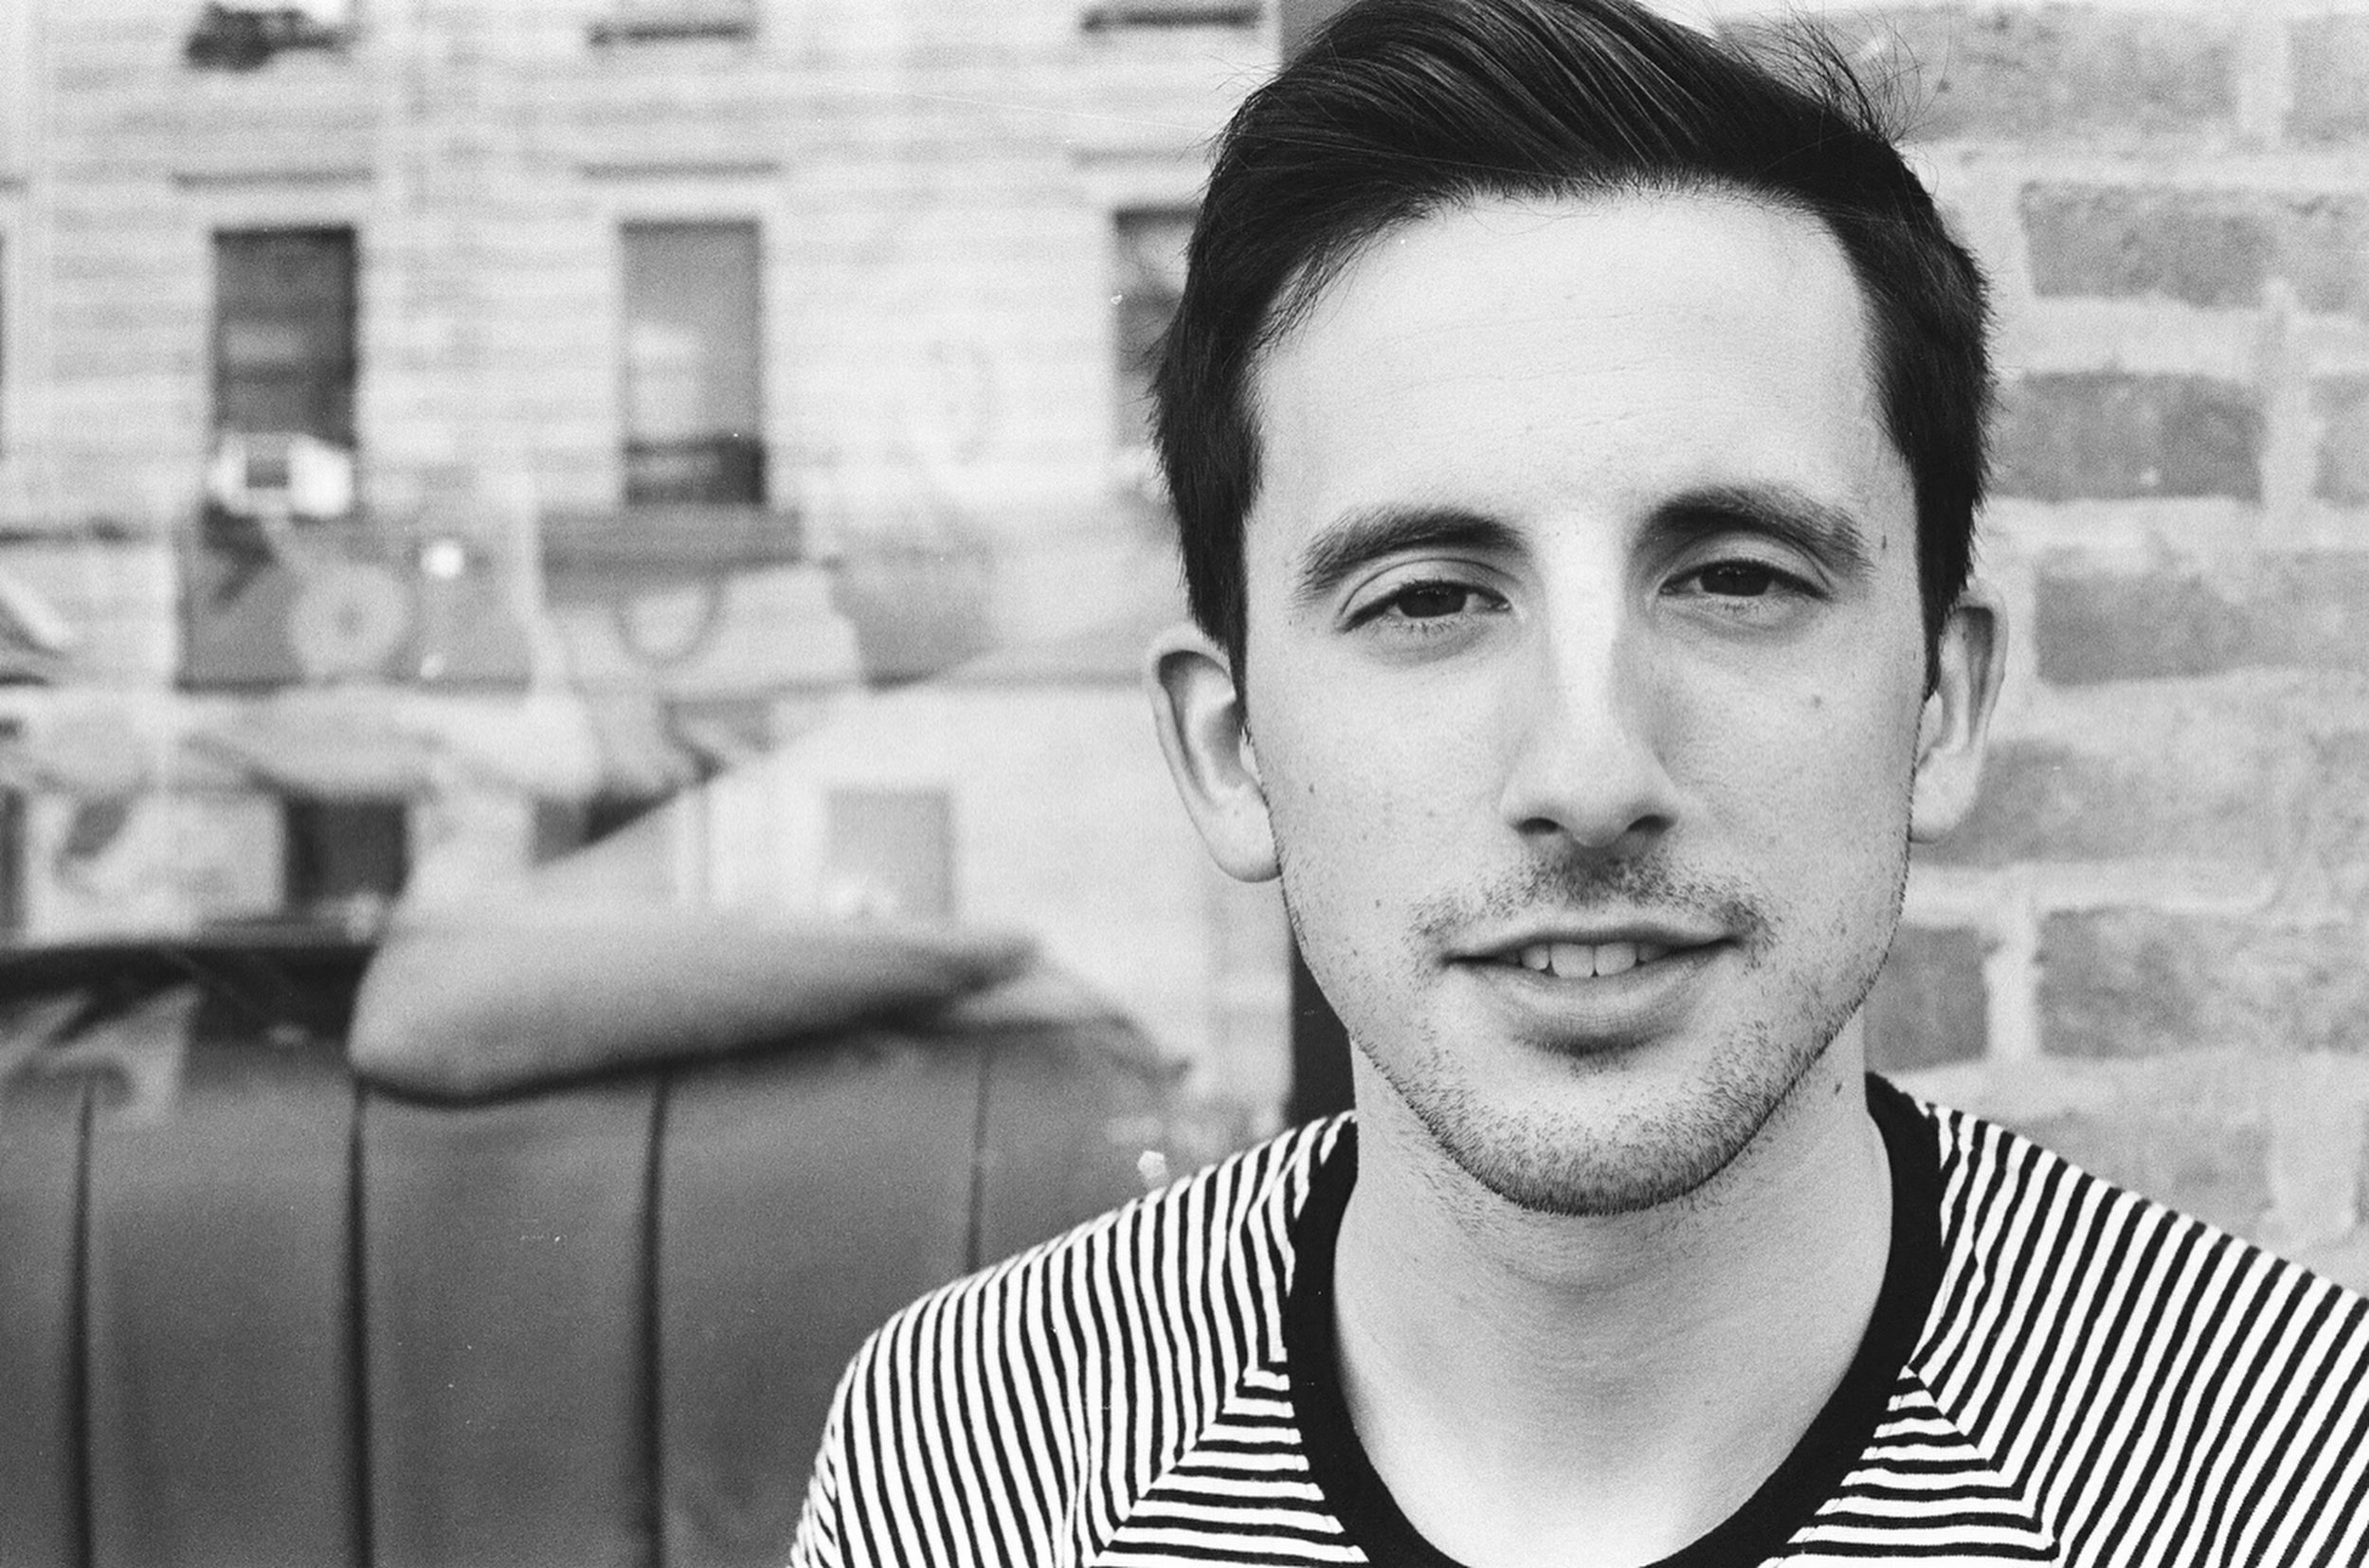 JG - JG is a photographer, lyricist, and aspiring cinematographer based in New York City.thejohngregory.com // @thejohngregory